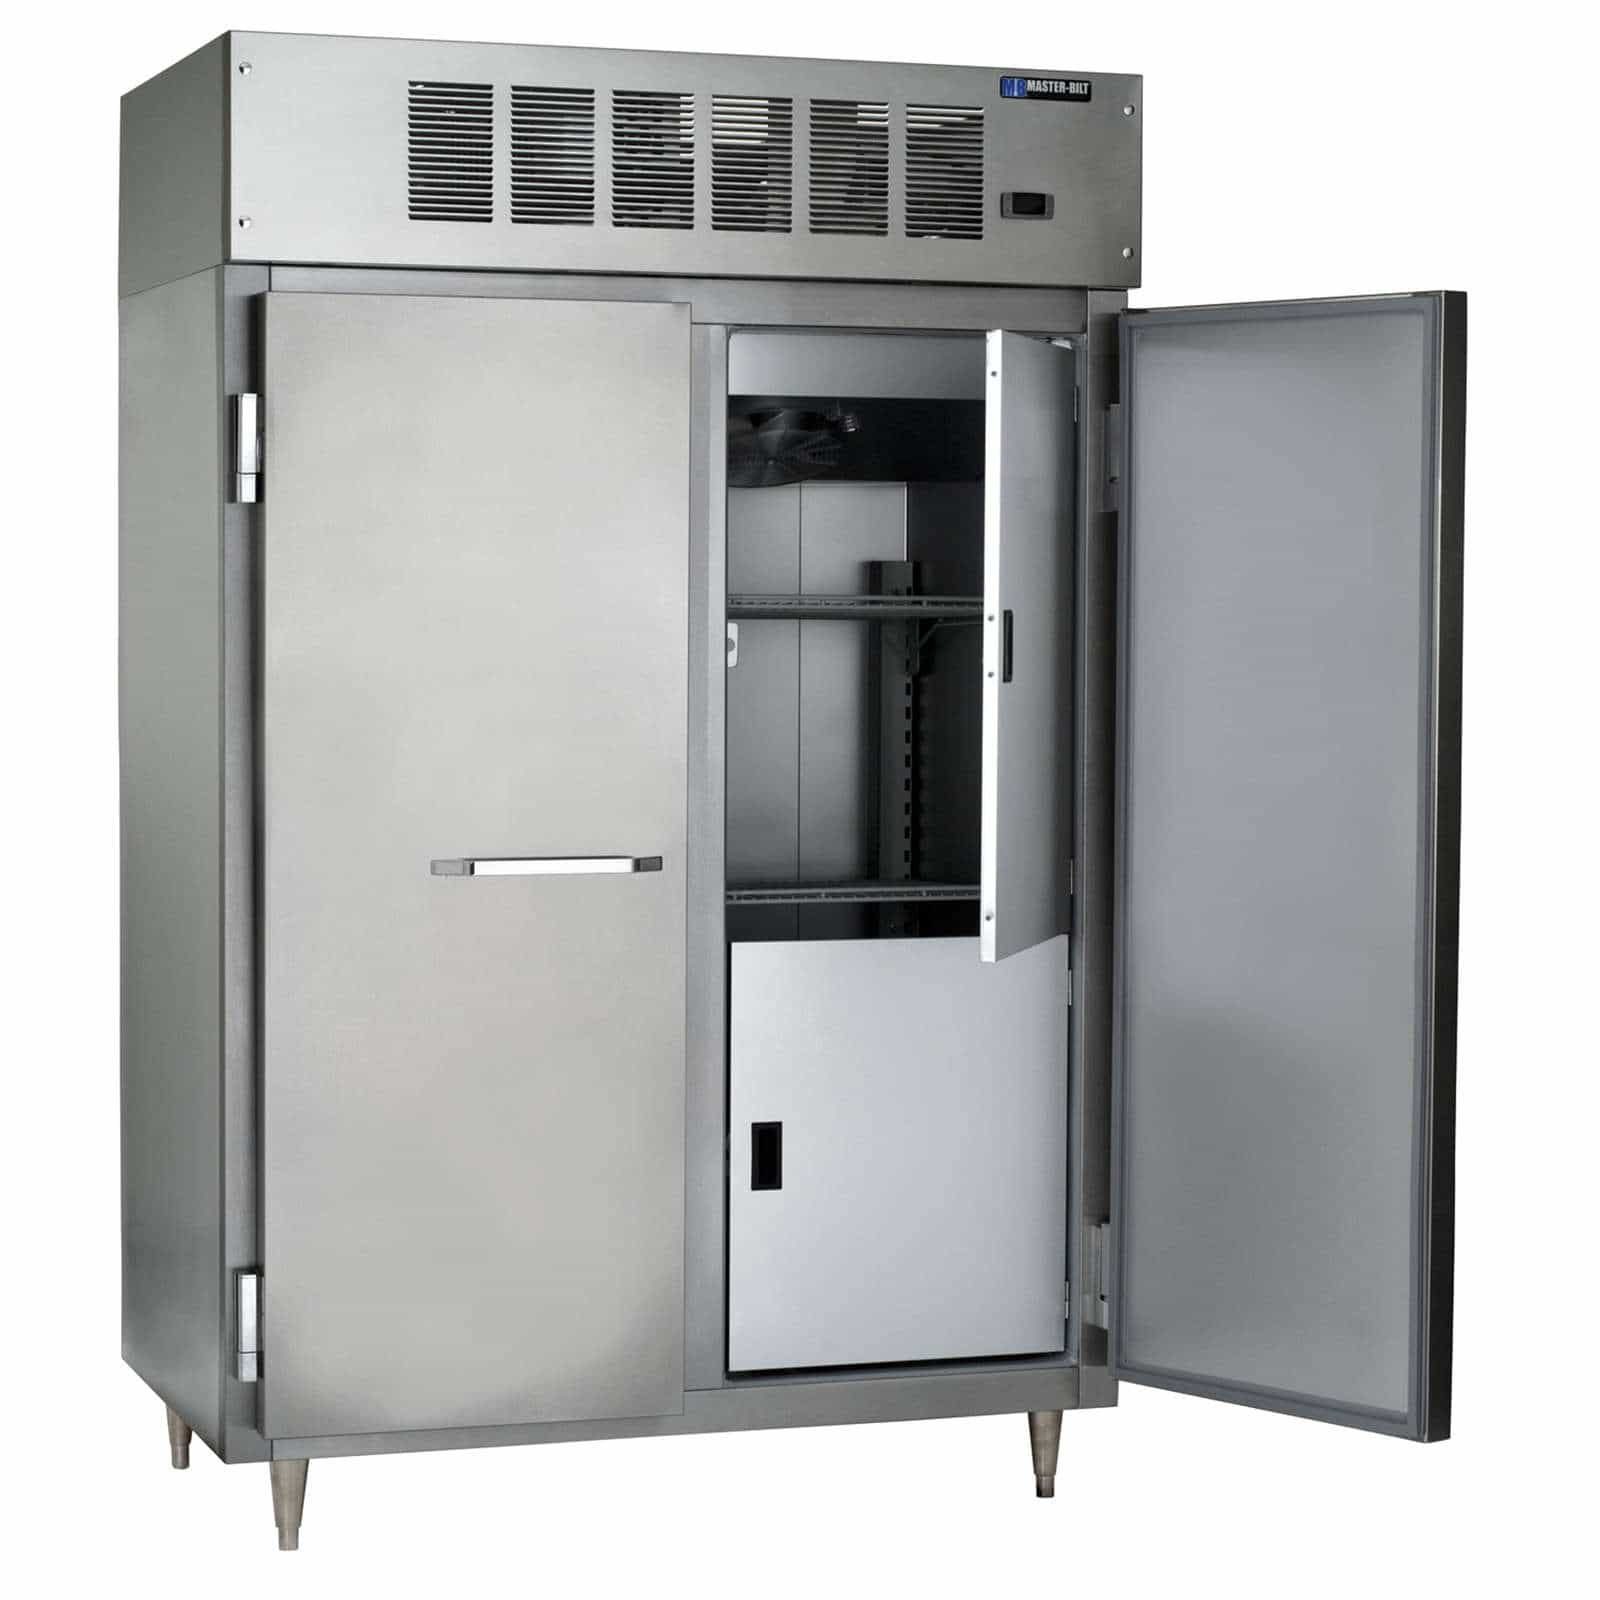 IHC-48 Ice Cream Hardening & Holding Cabinet   CKitchen.com